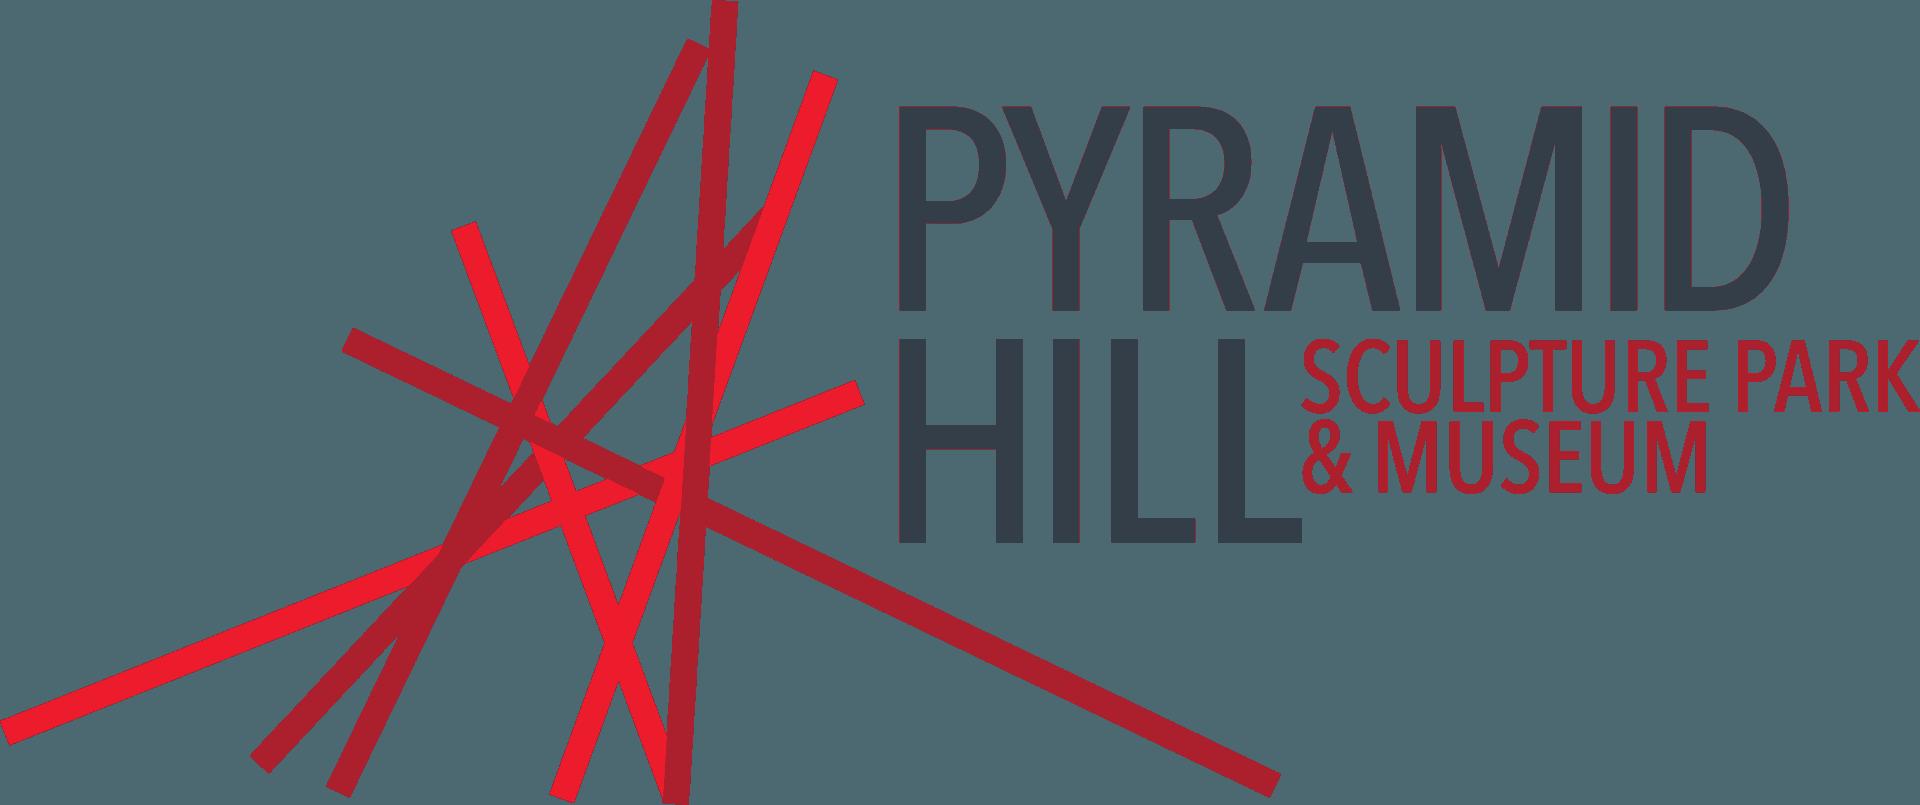 Pyramid Hill Sculpture Park & Museum